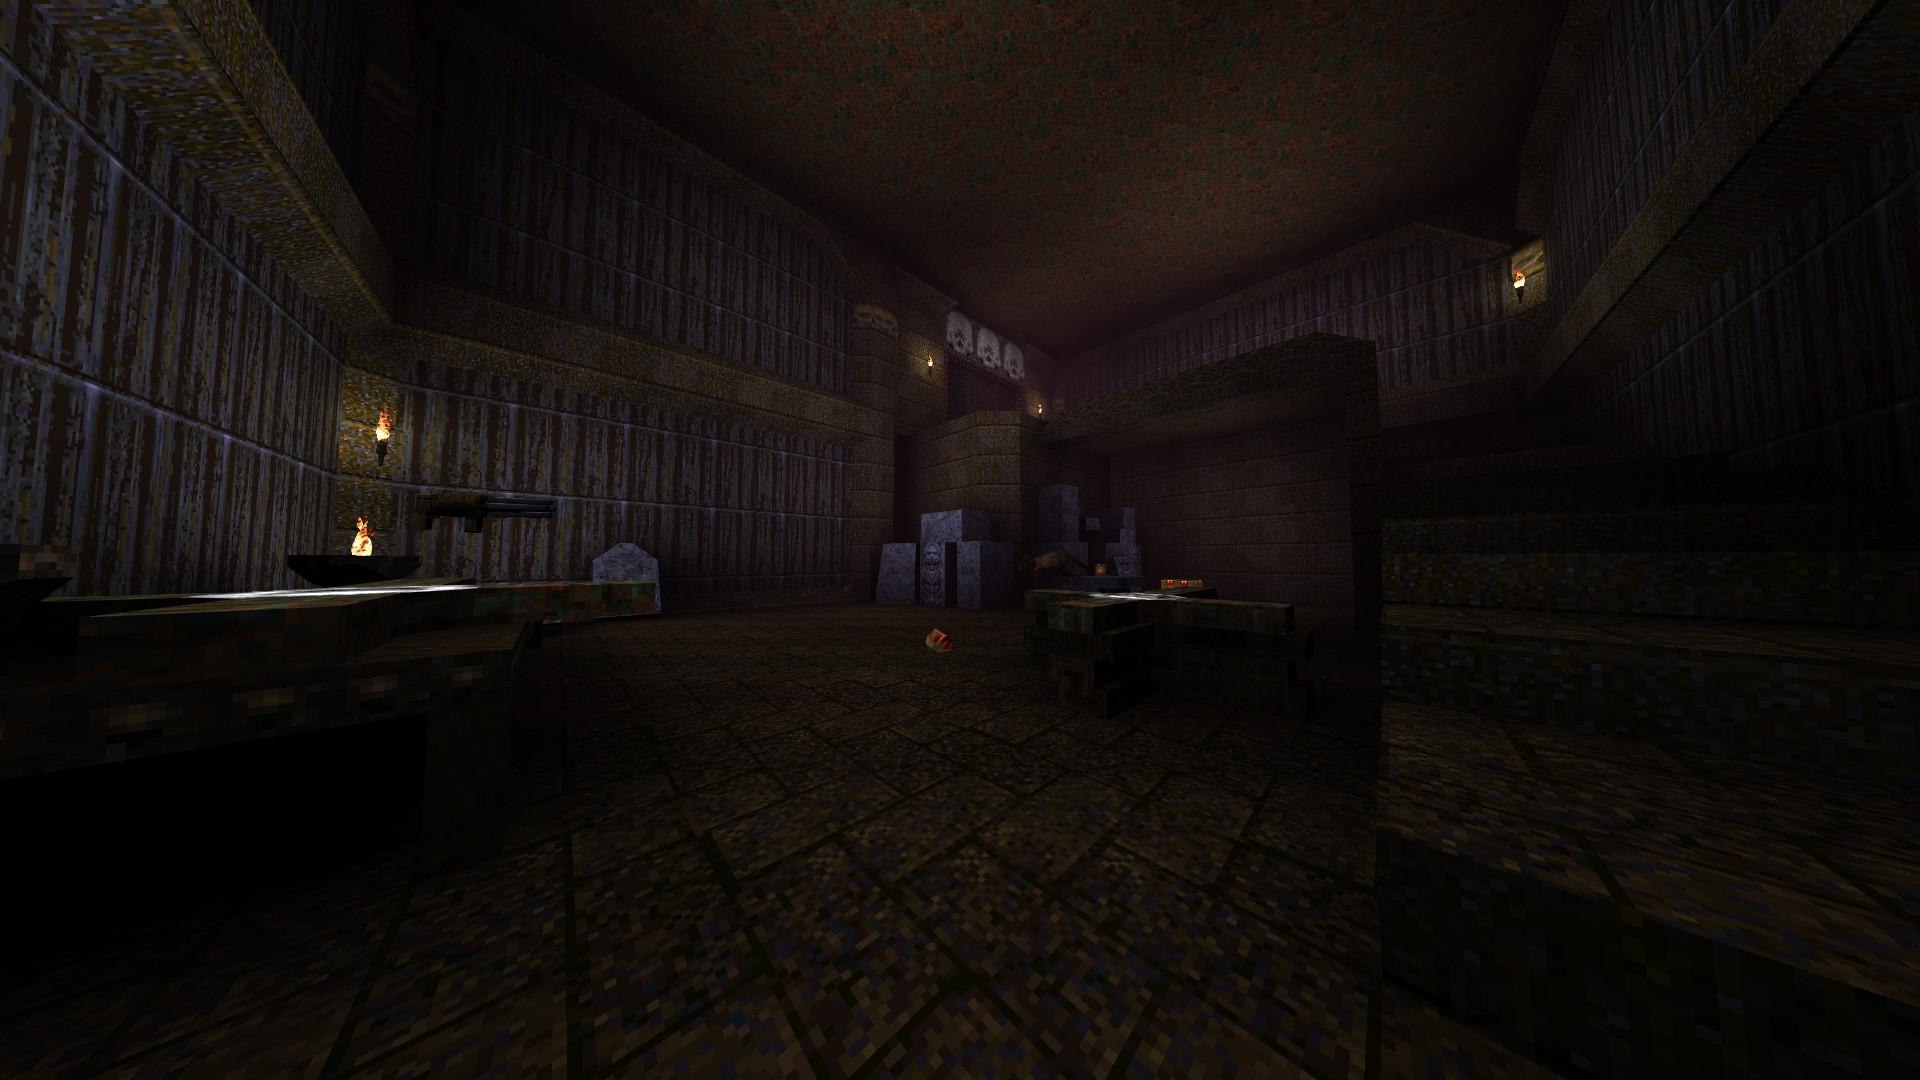 Quake - Locations of All Secrets in Game Tips - E2: Dominion of Darkness - Part II - 8E8ABA3